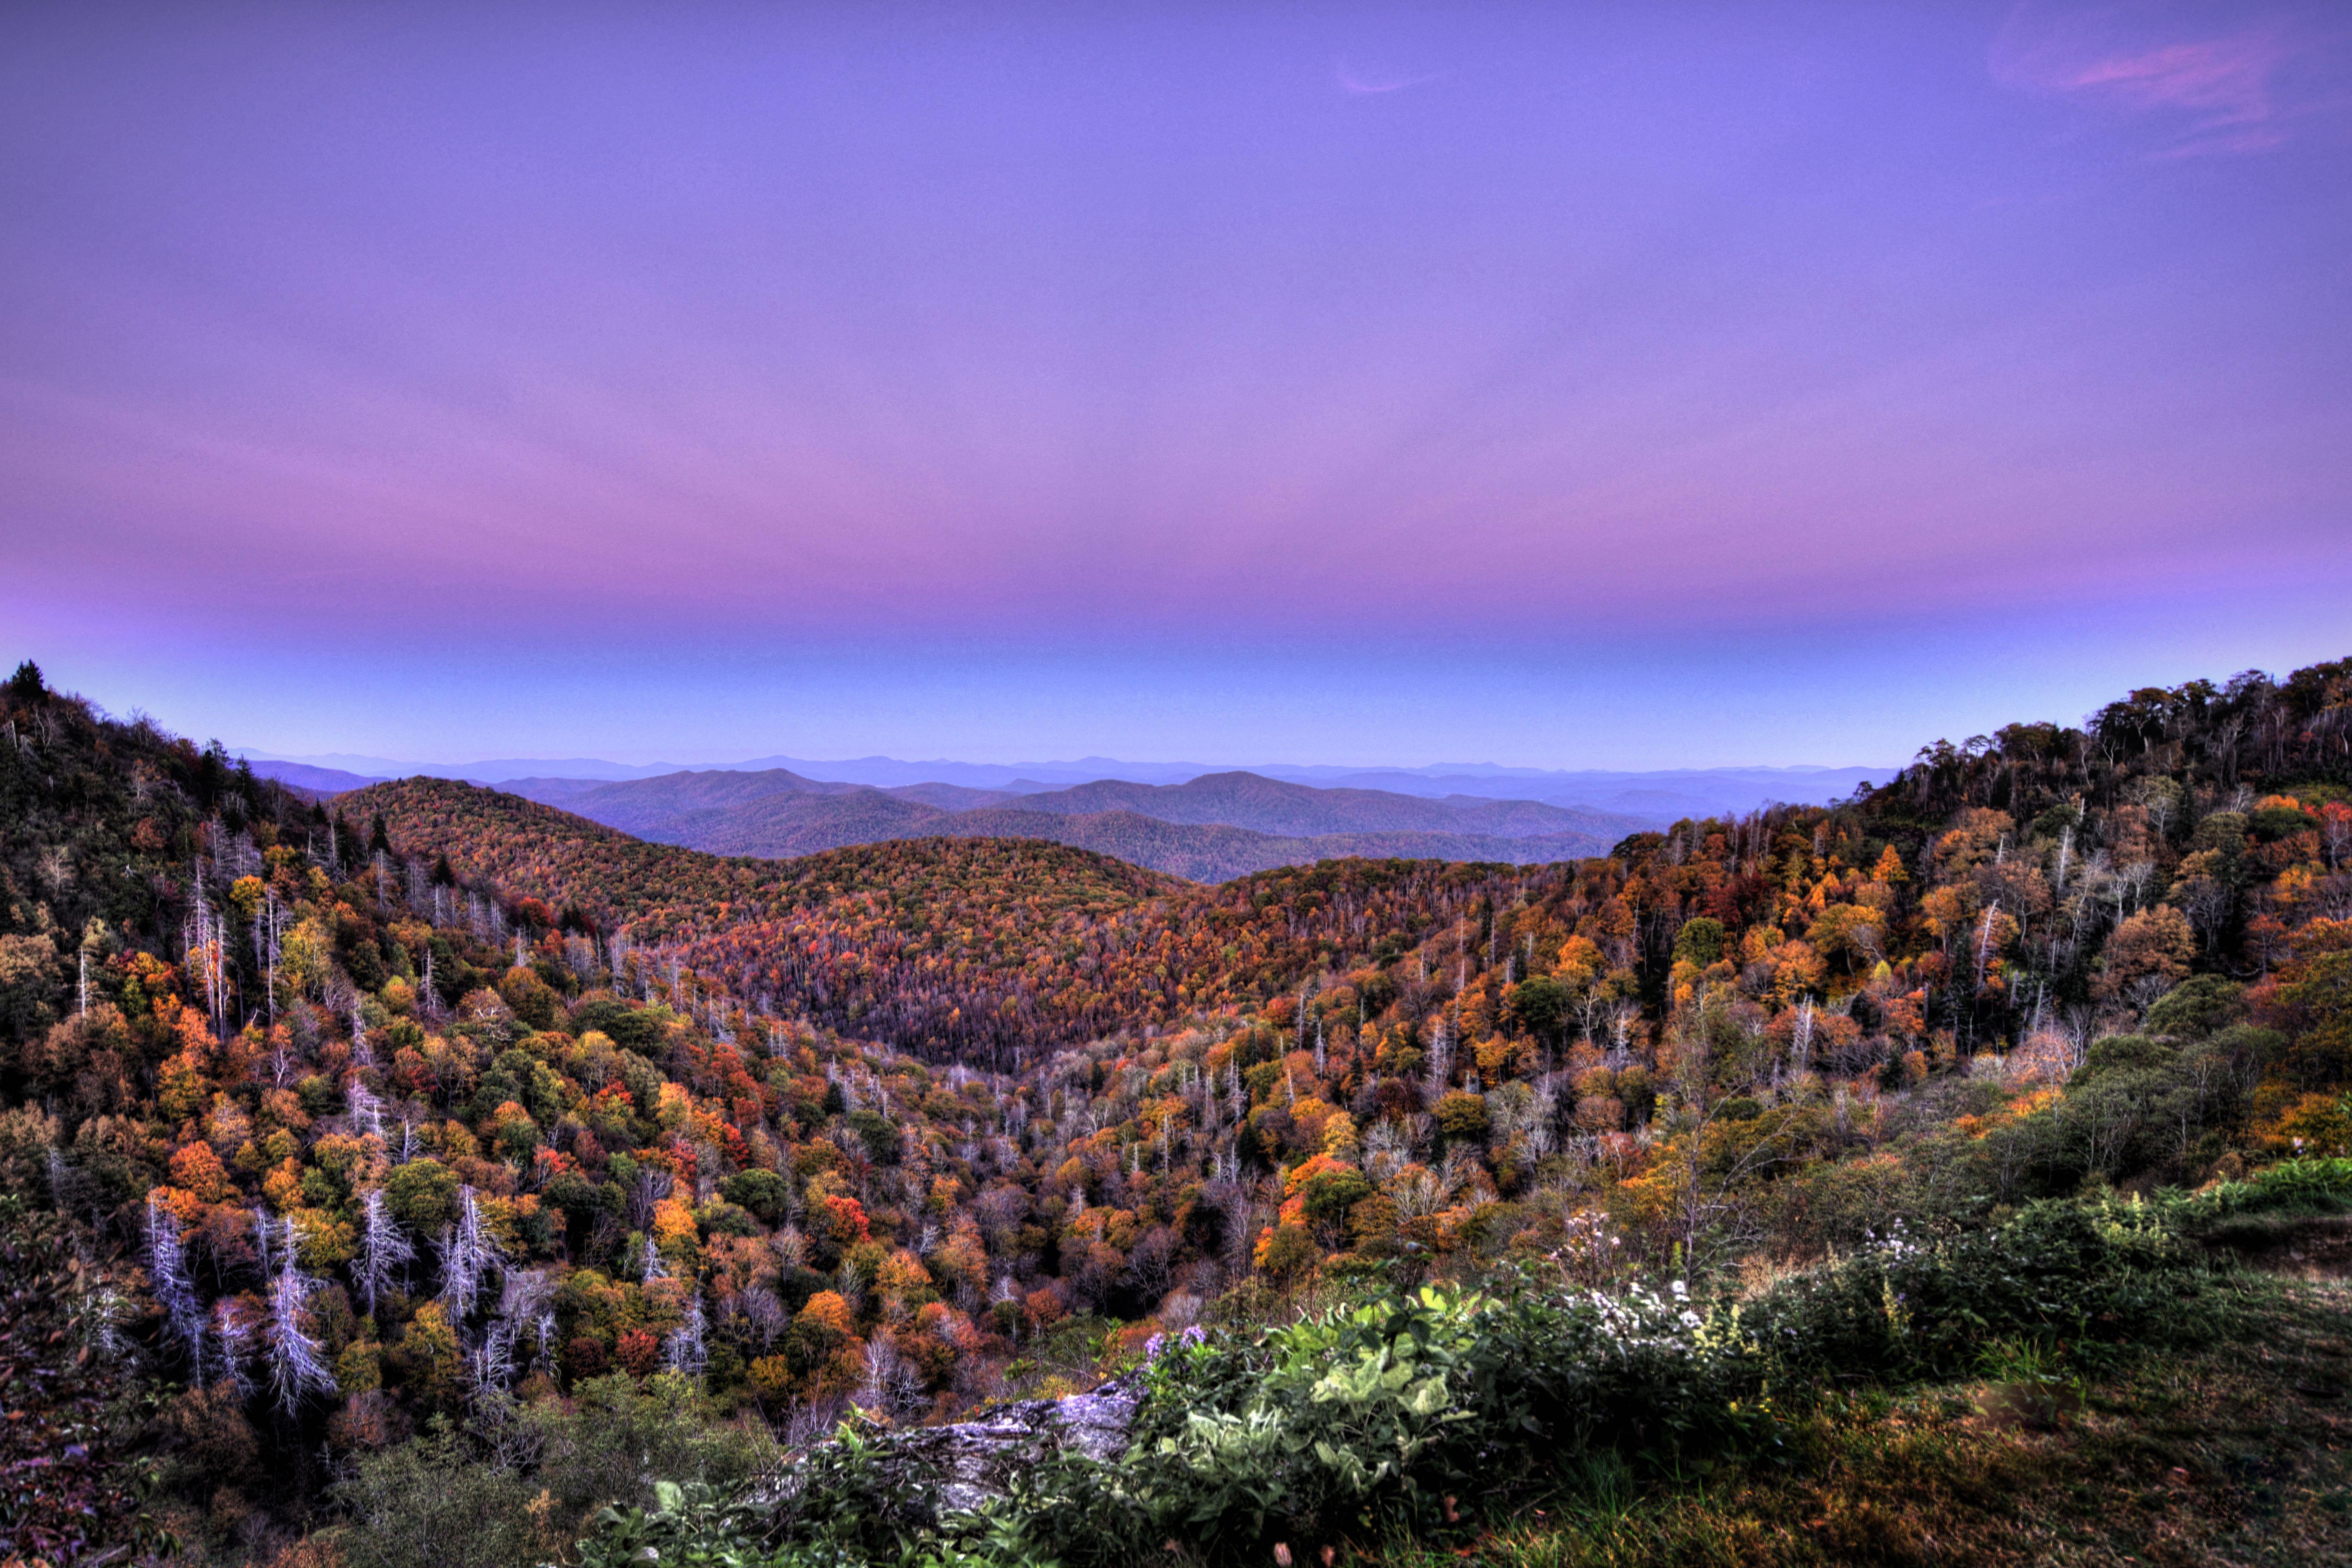 Blueridge Overlook